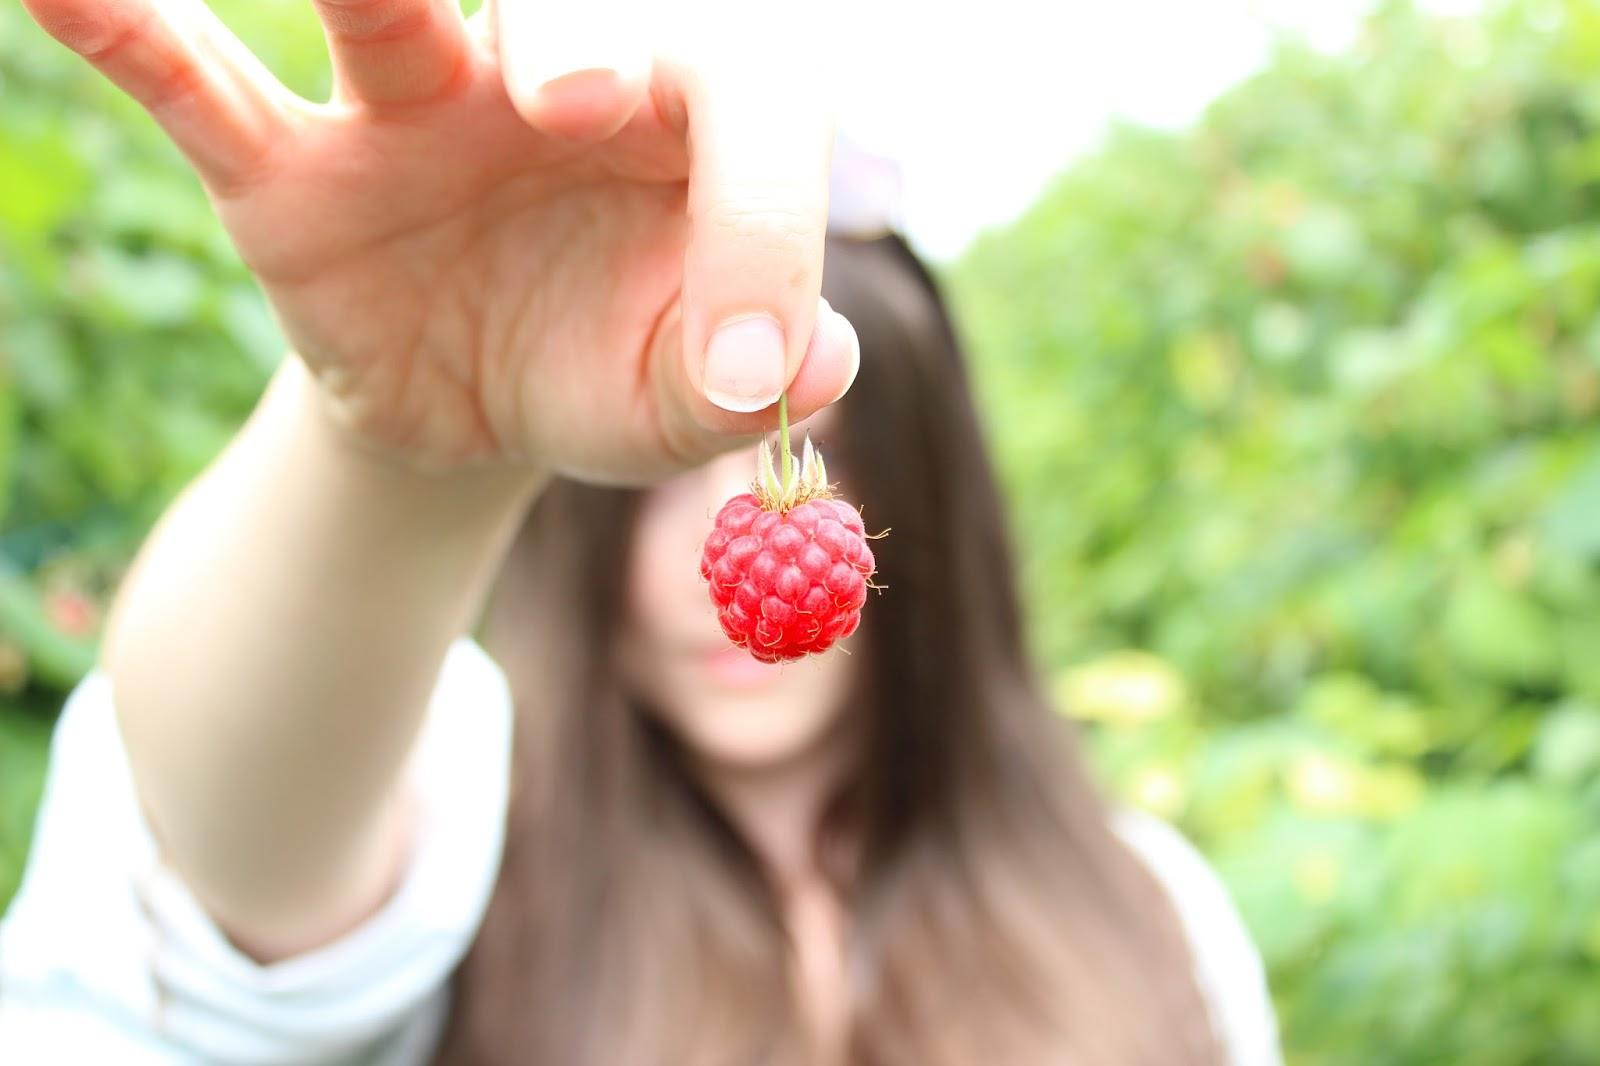 Summer: Berry Picking